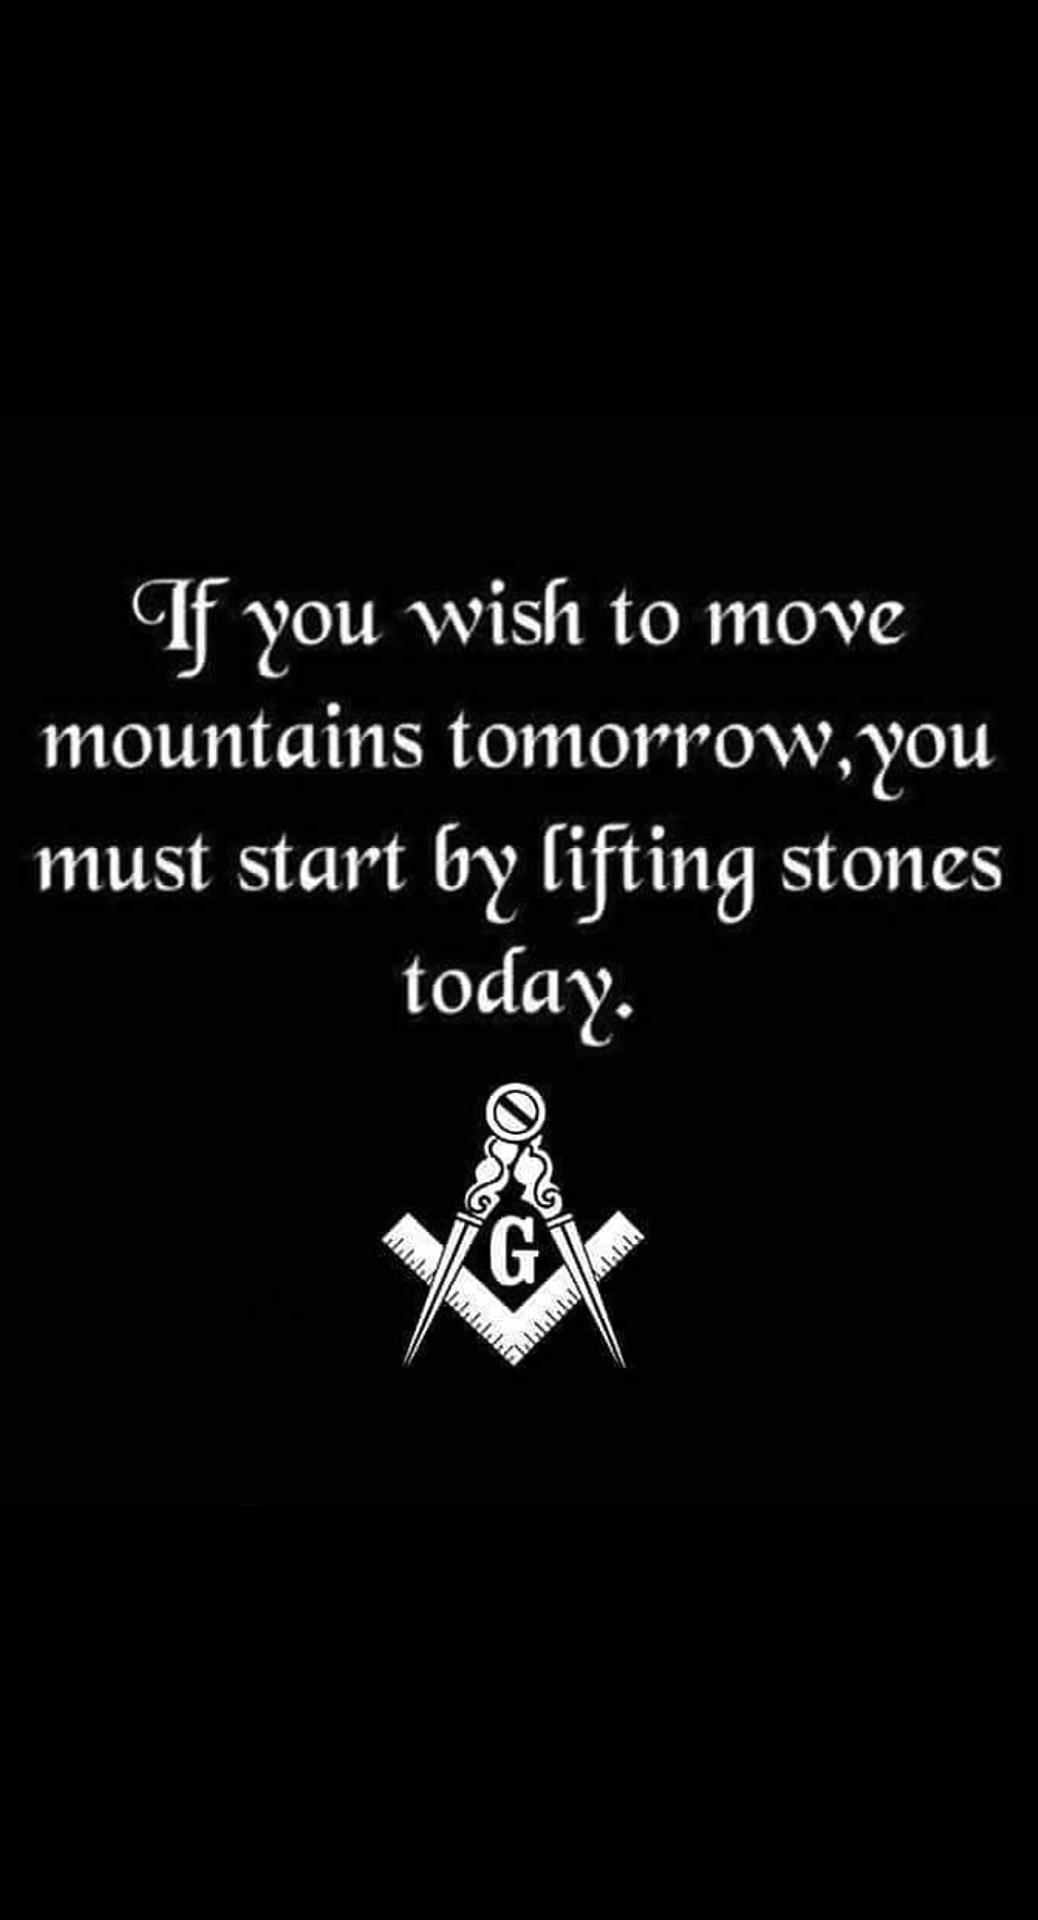 [Image] Start now.